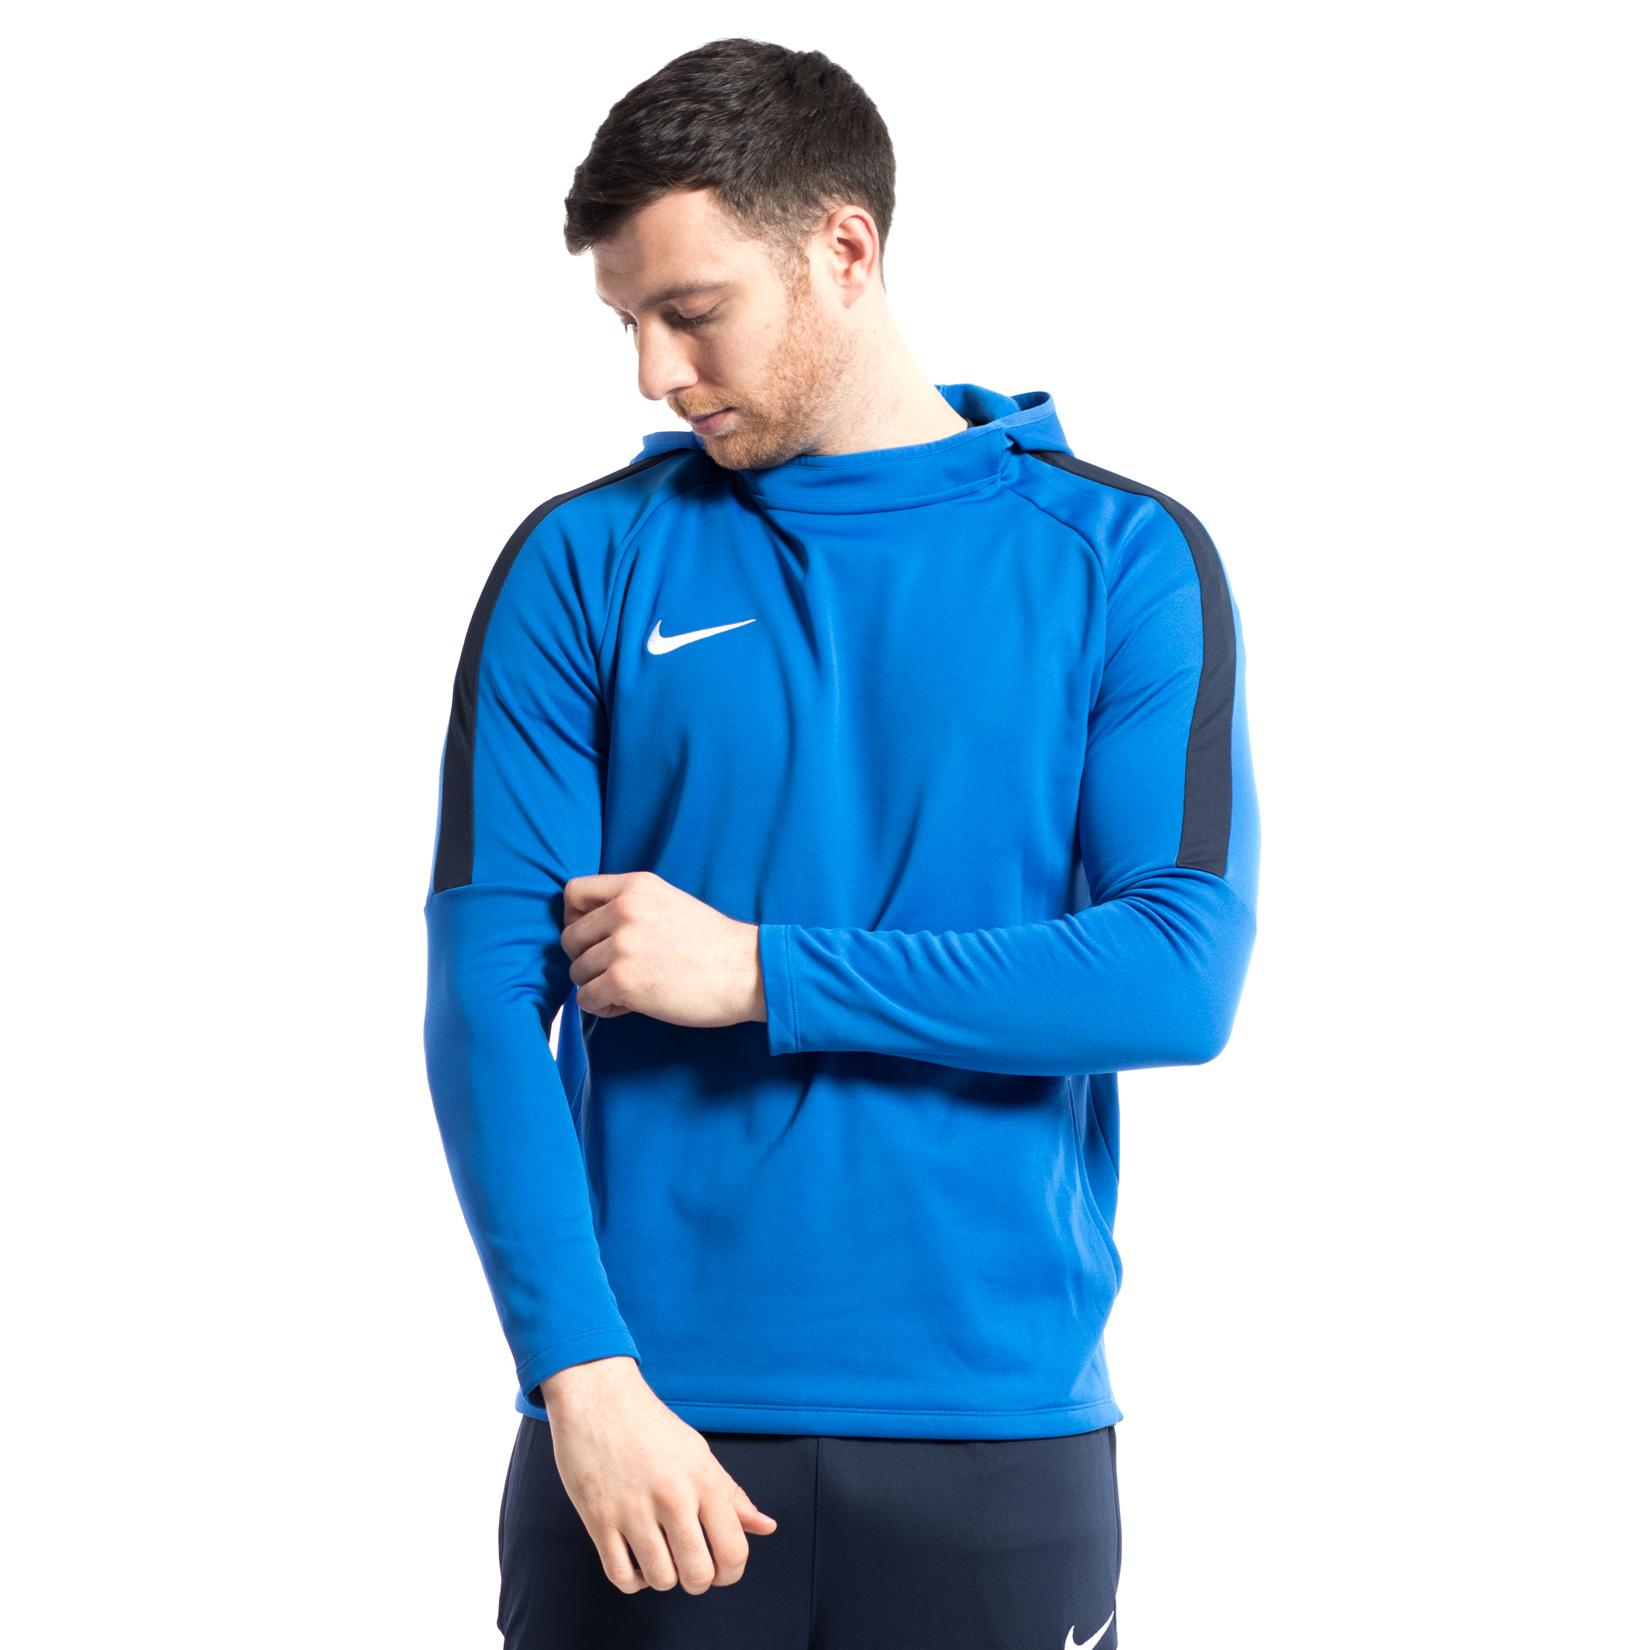 Nike Training Performance Hoodie - Adults £28.41, Kids £22.41 (+£2.50 P&P) @ Kitlocker